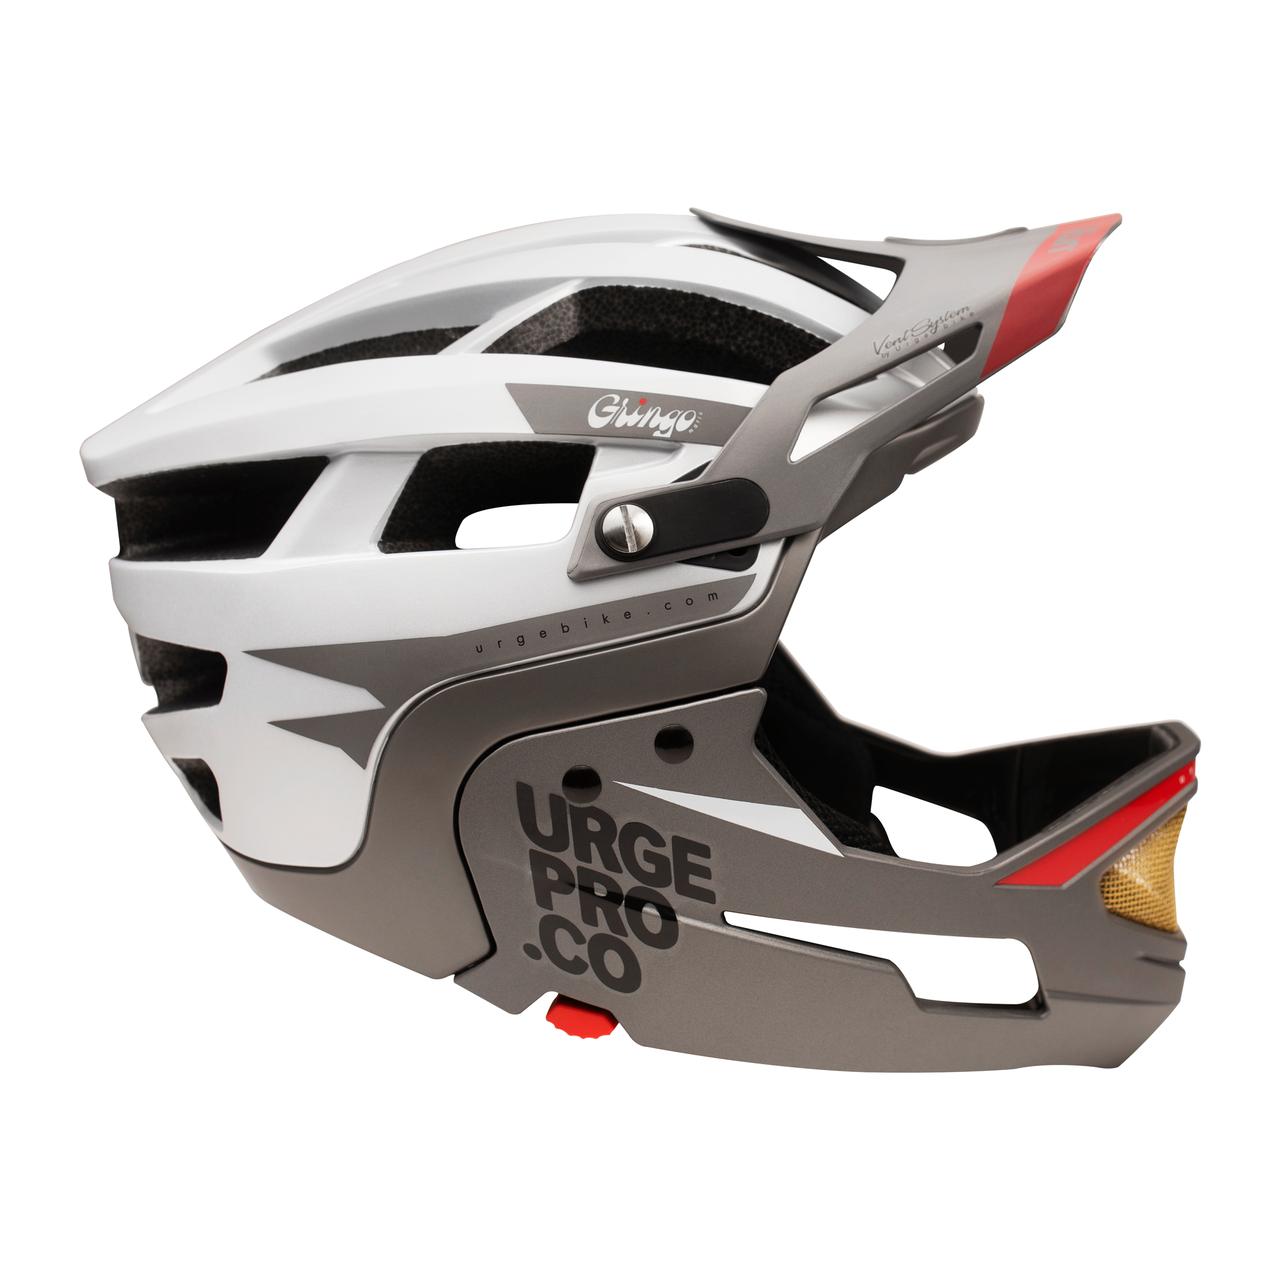 Шлем Urge Gringo de la Sierra серый S/M, 55-58 см